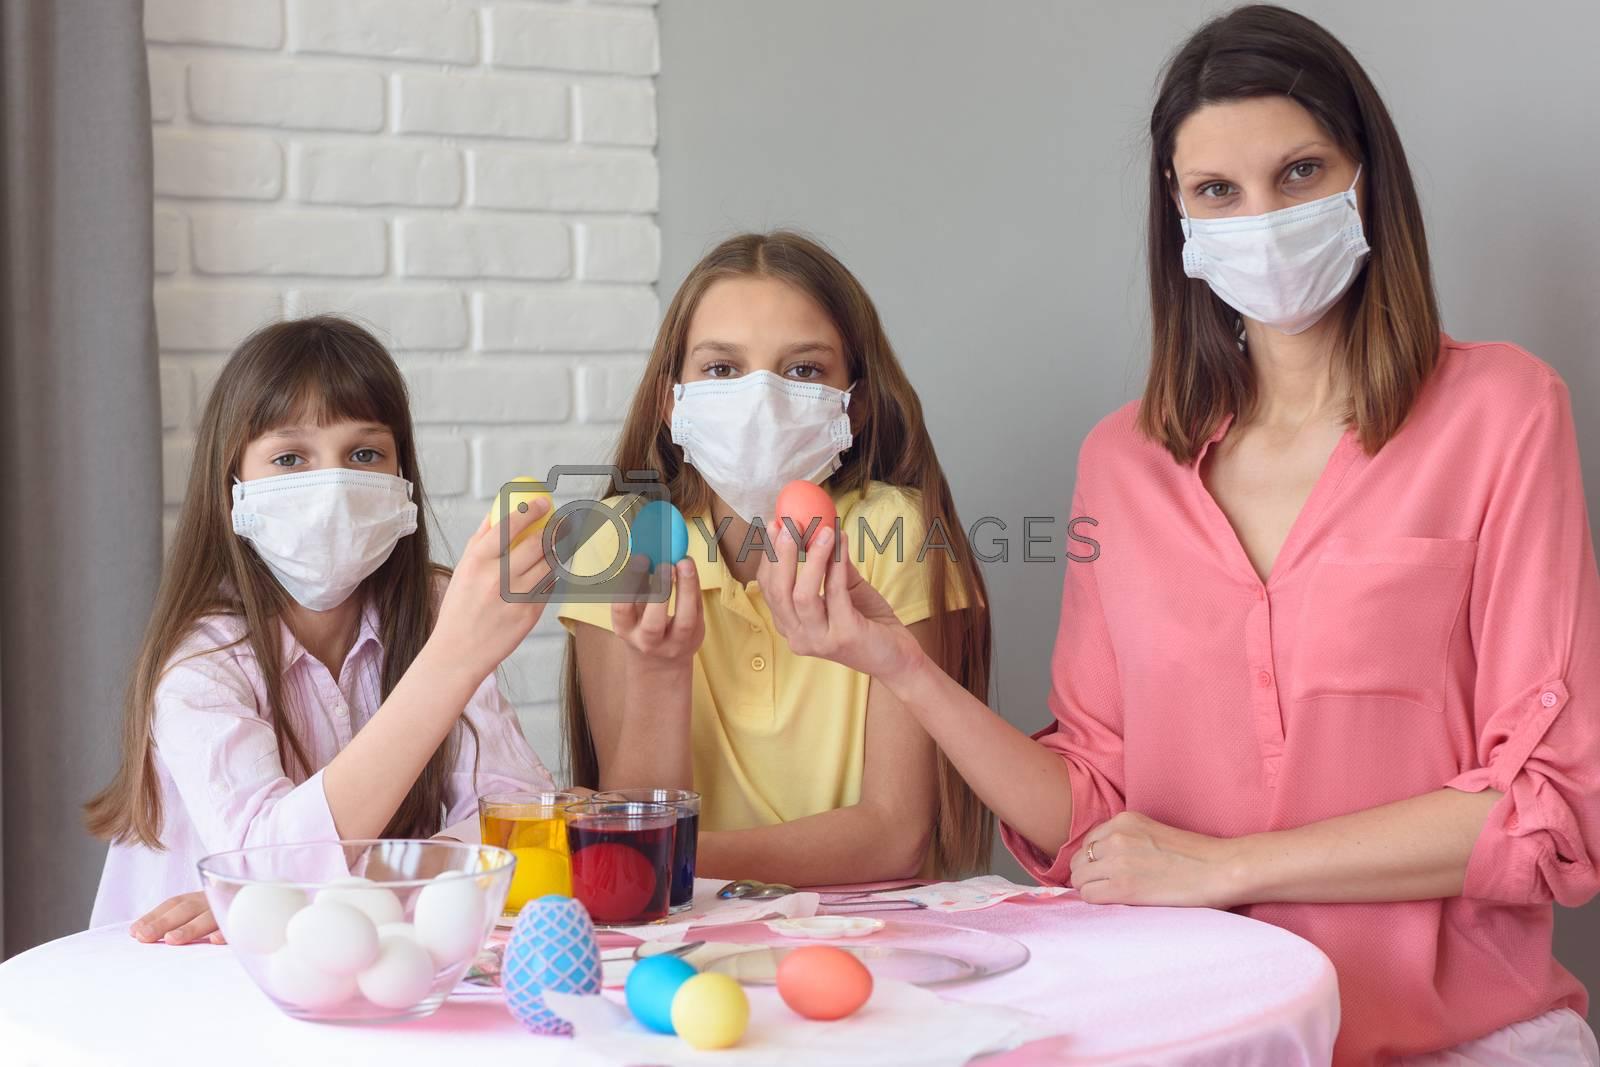 quarantined family paints eggs for easter